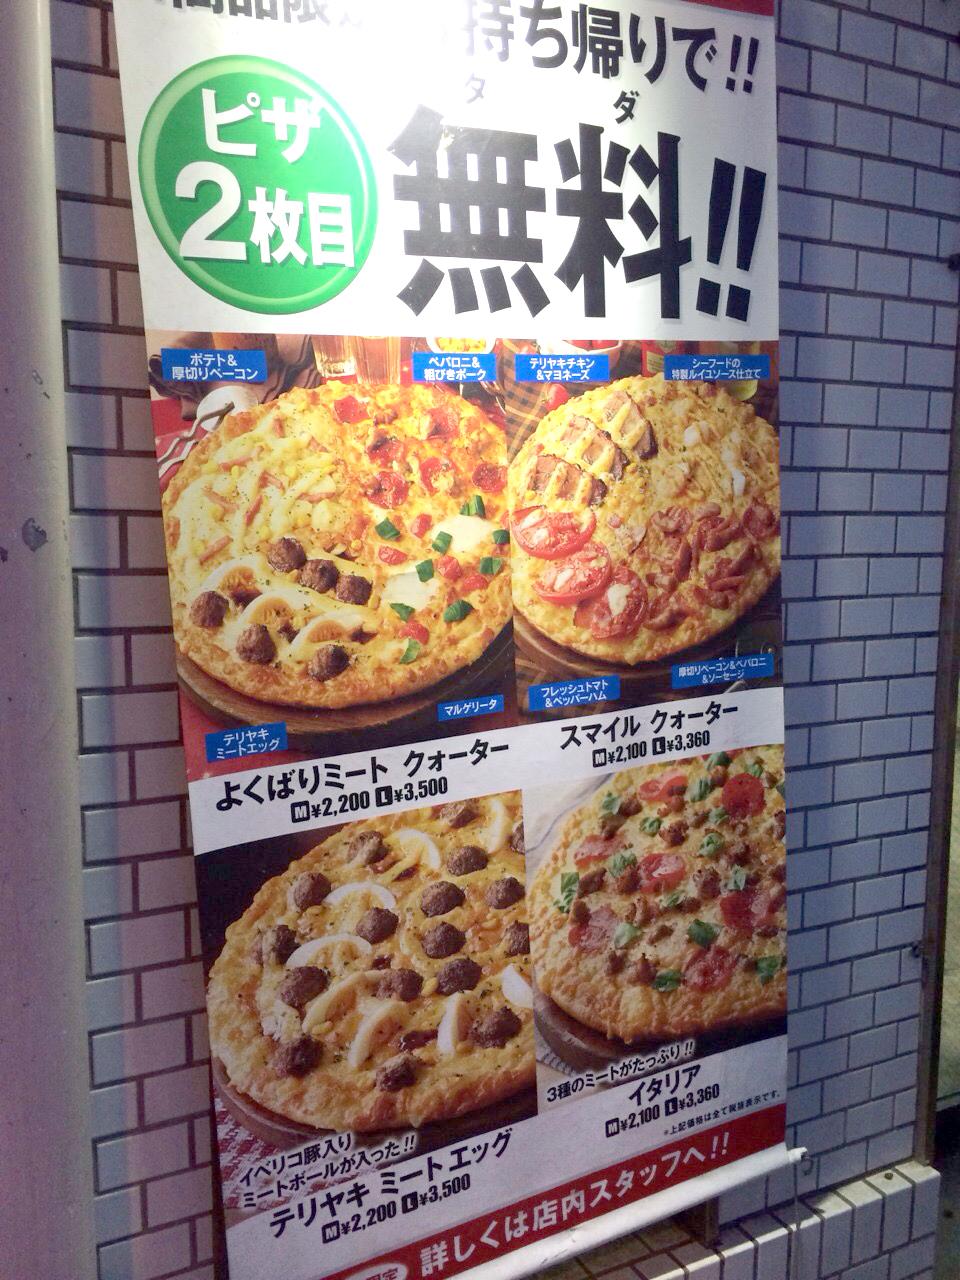 枚 ピザ 無料 二 目